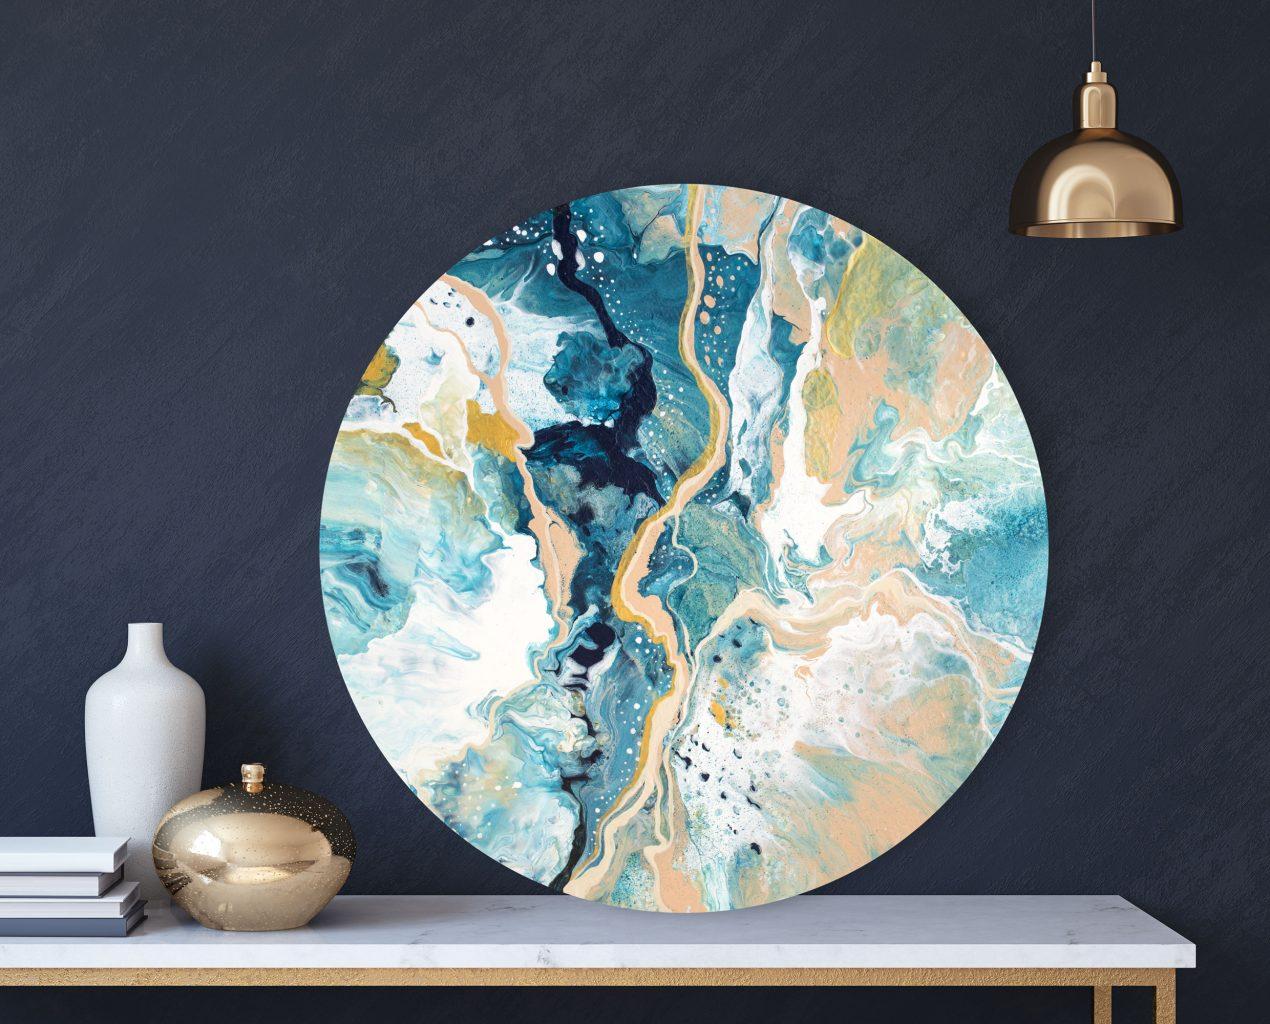 Original Round Painting: Marble World 12